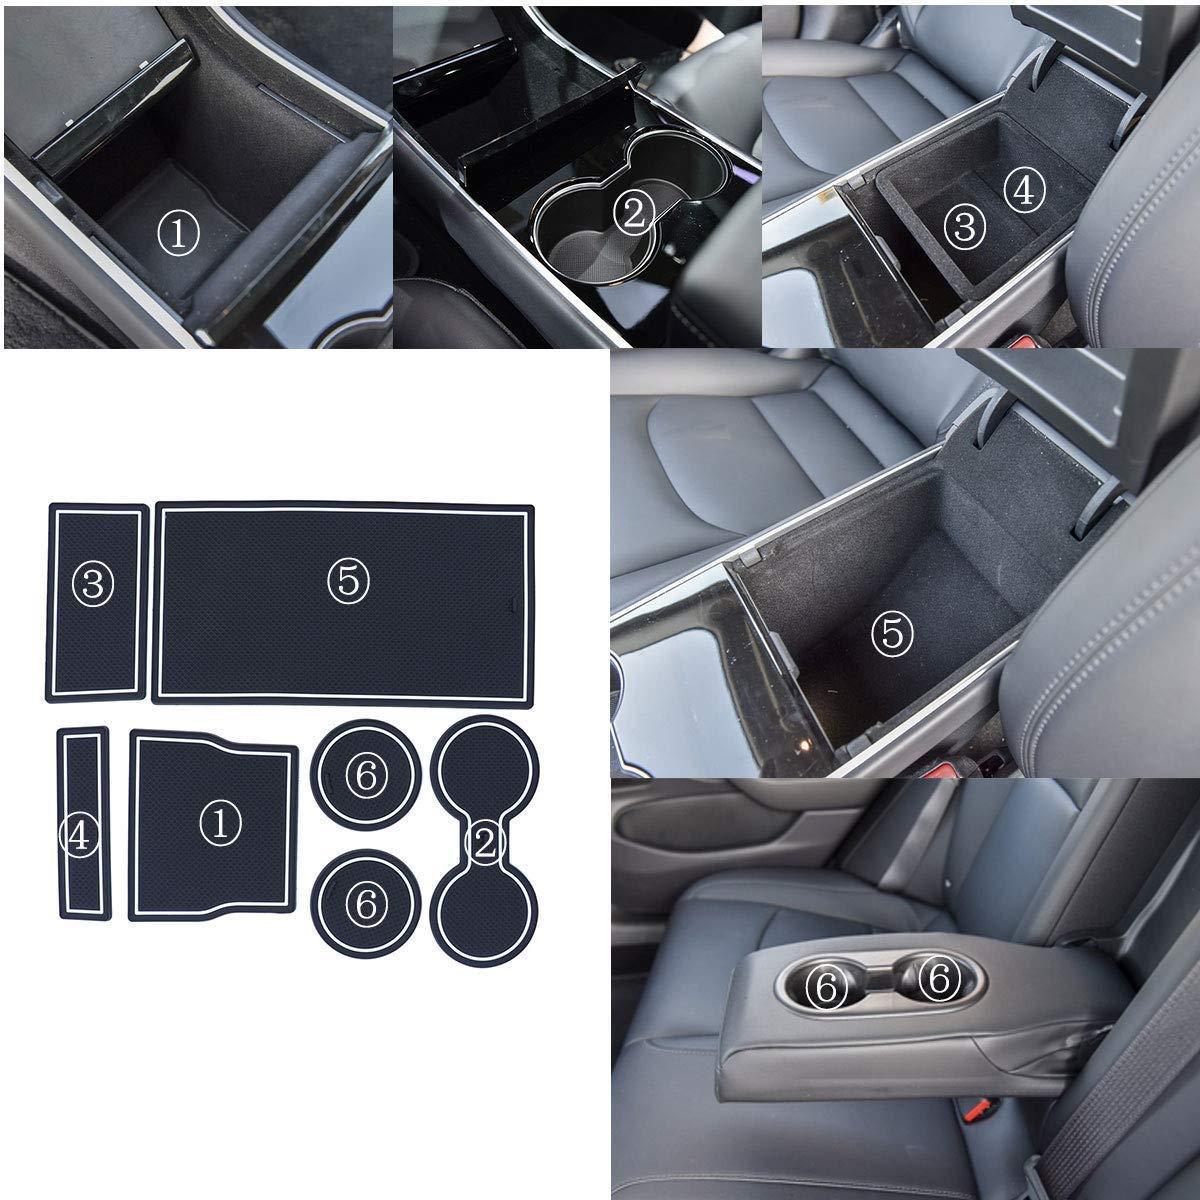 JDopption Car Styling Rubber Gate Slot Pad Mat Cup Mat for Tesla Model 3 2017 2018 2019 White